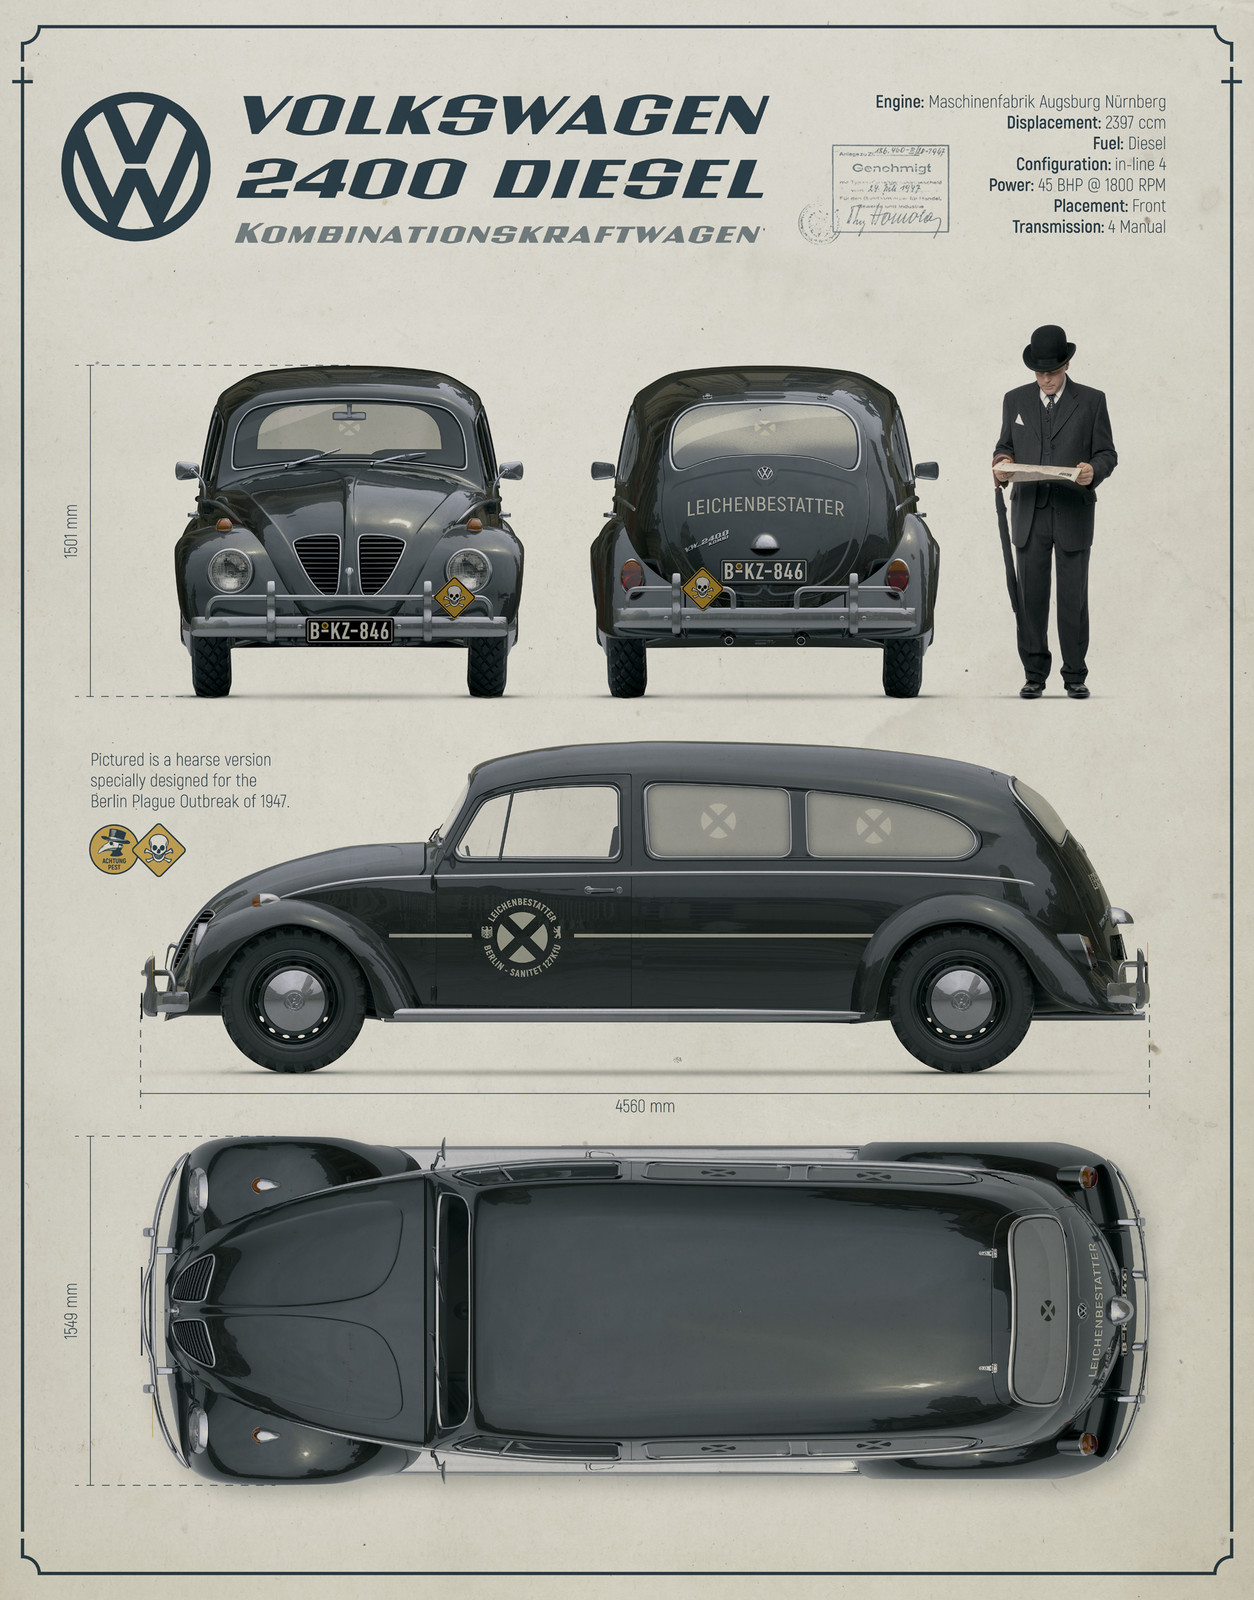 VW Type 1 2400 Diesel, specifications